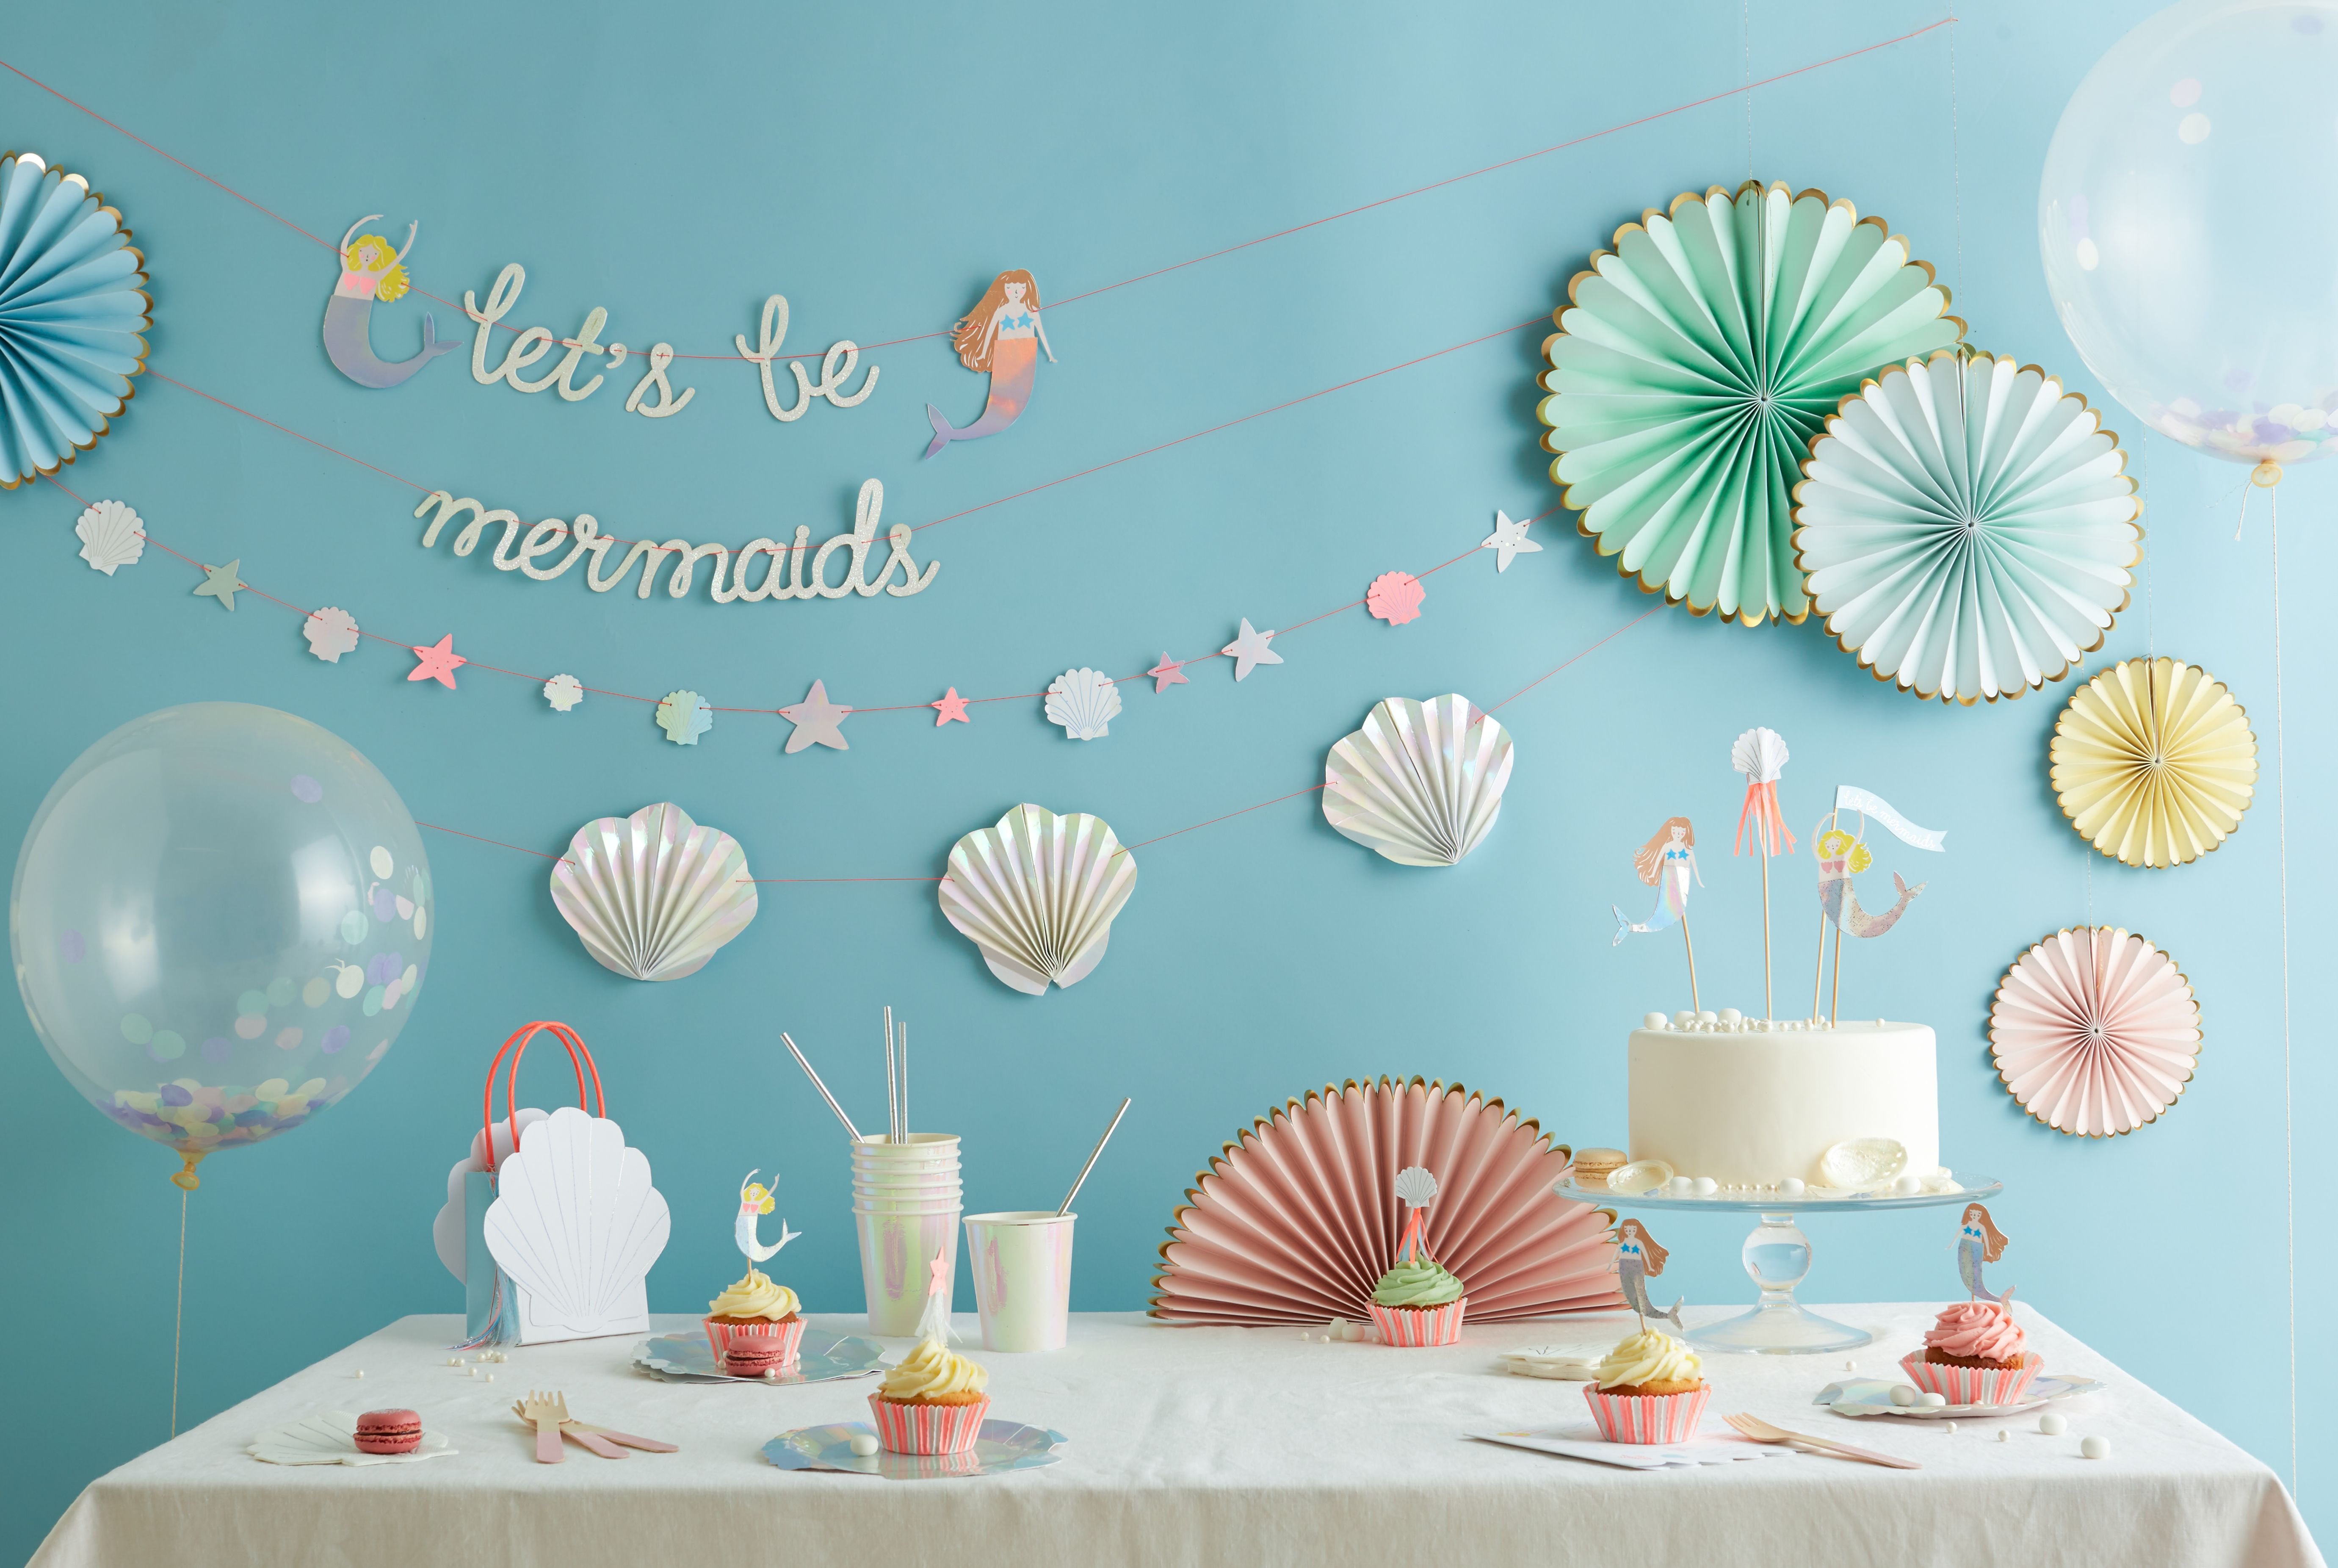 Mermaid Theme Party Mermaid Birthday Party Mermaid Party Ideas